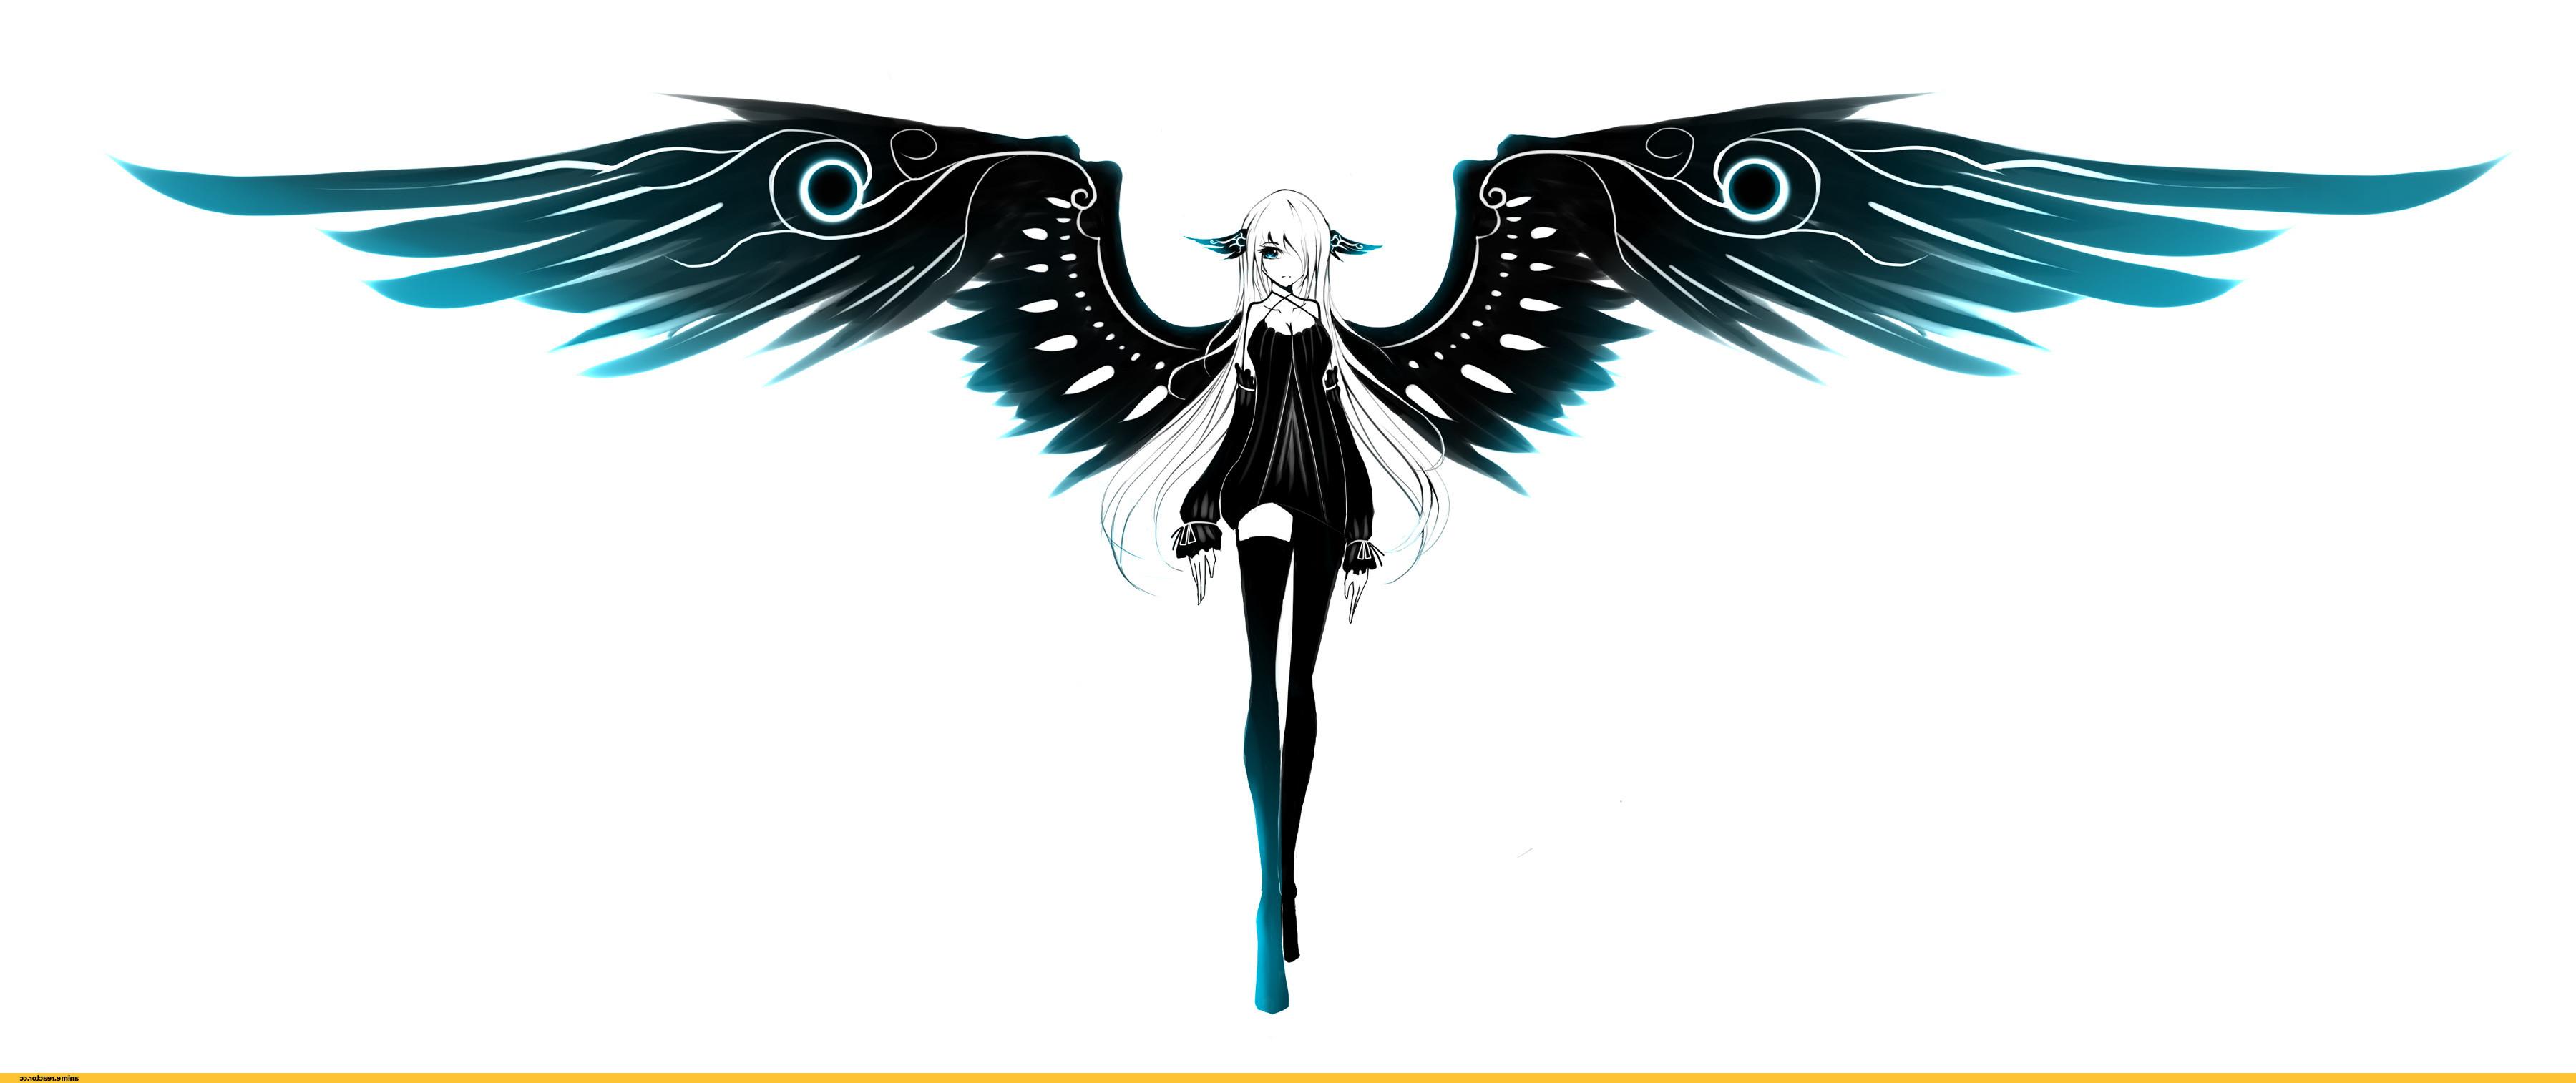 3600x1514 Angel Wings Wallpapers On Wallpaperplay